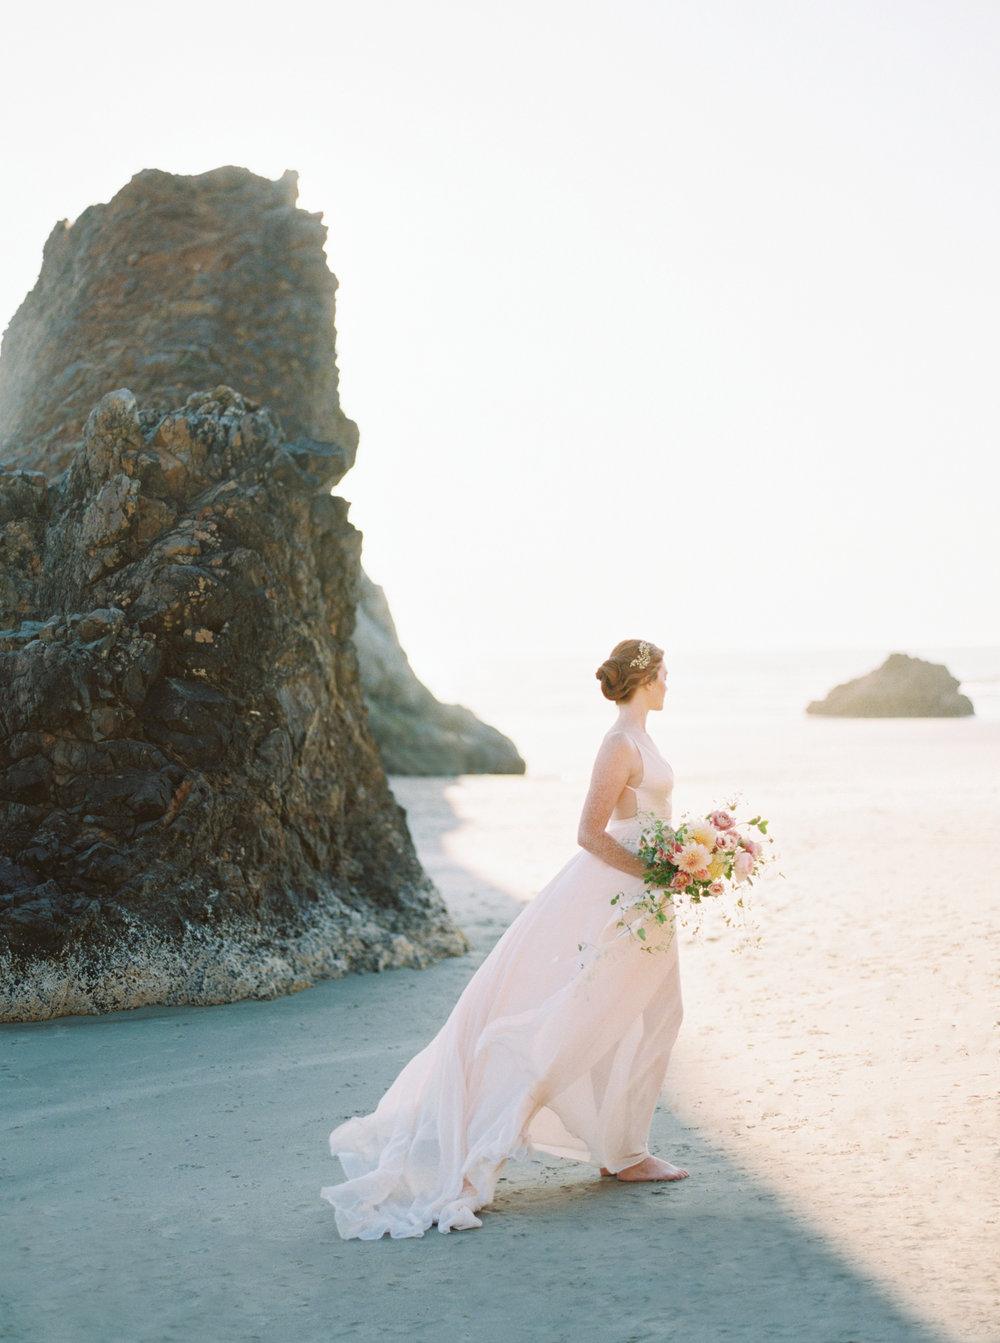 Niagara Fine Art Wedding Photographer - Cannon Beach, Oregon